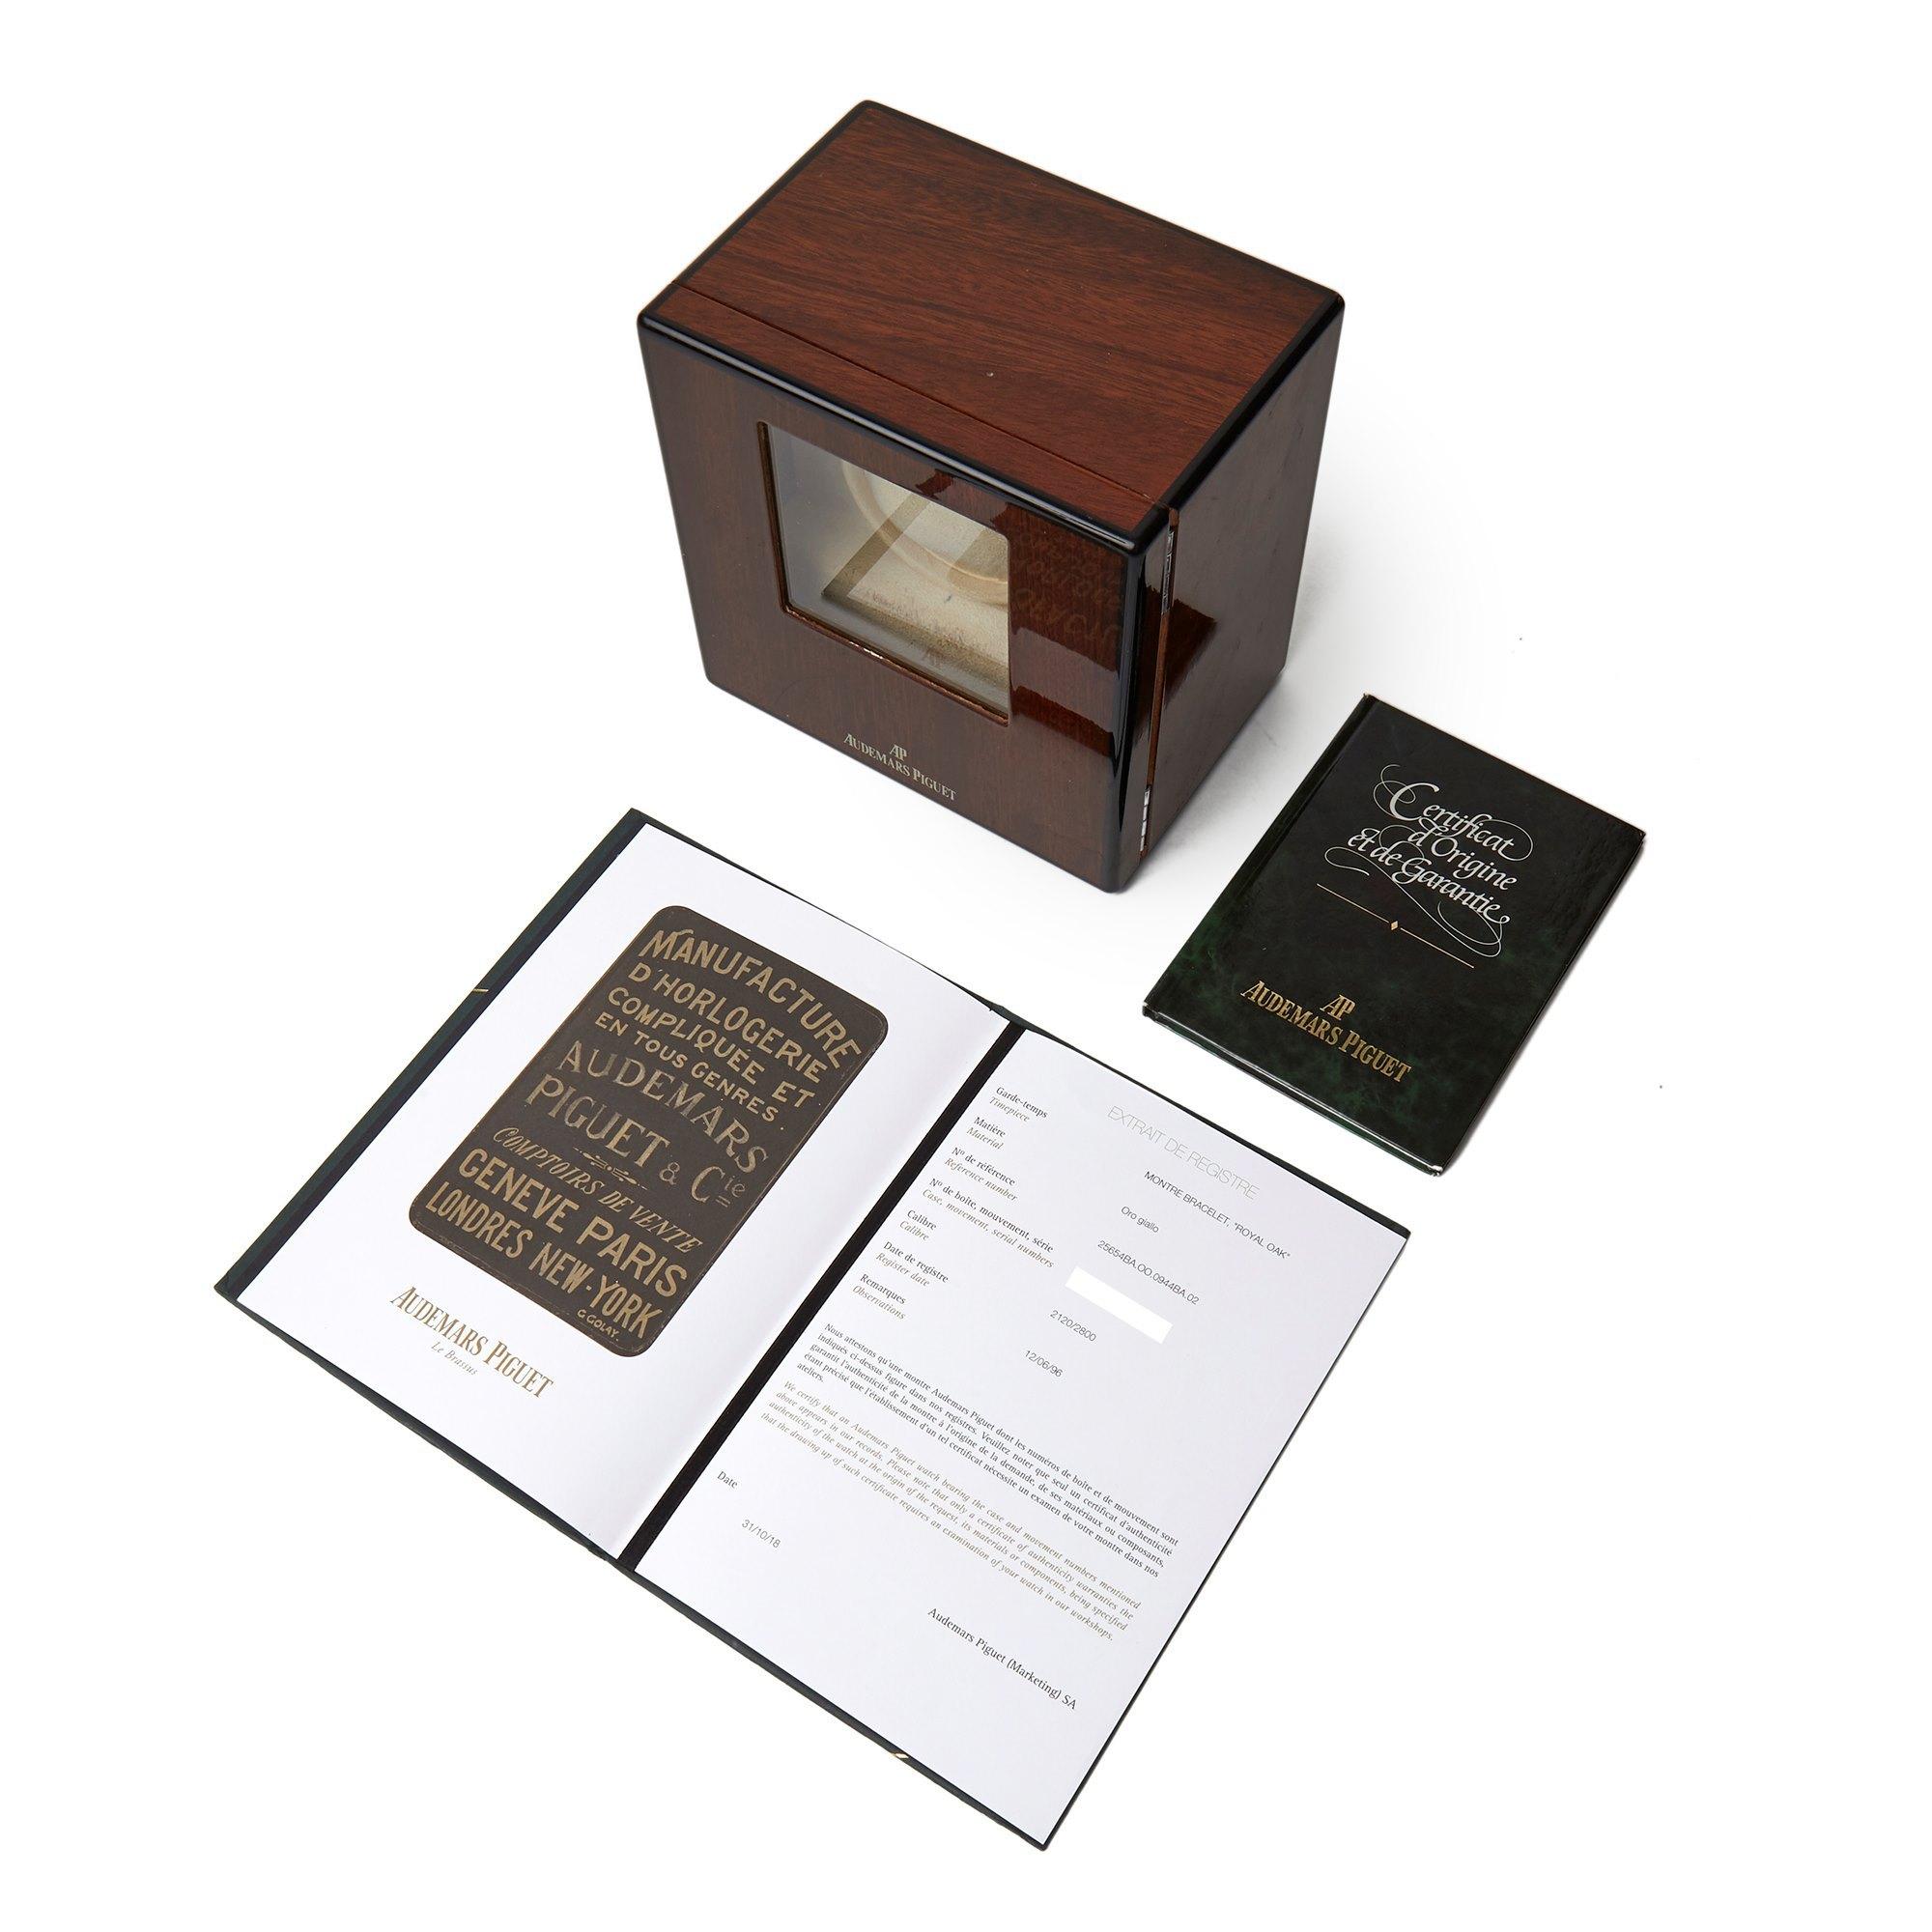 Audemars Piguet Royal Oak Perpetual Calendar Tuscan Dial 1st Series 18K Yellow Gold - 25654BA.OO.0944BA.02 Yellow Gold 25654BA.OO.0944BA.02